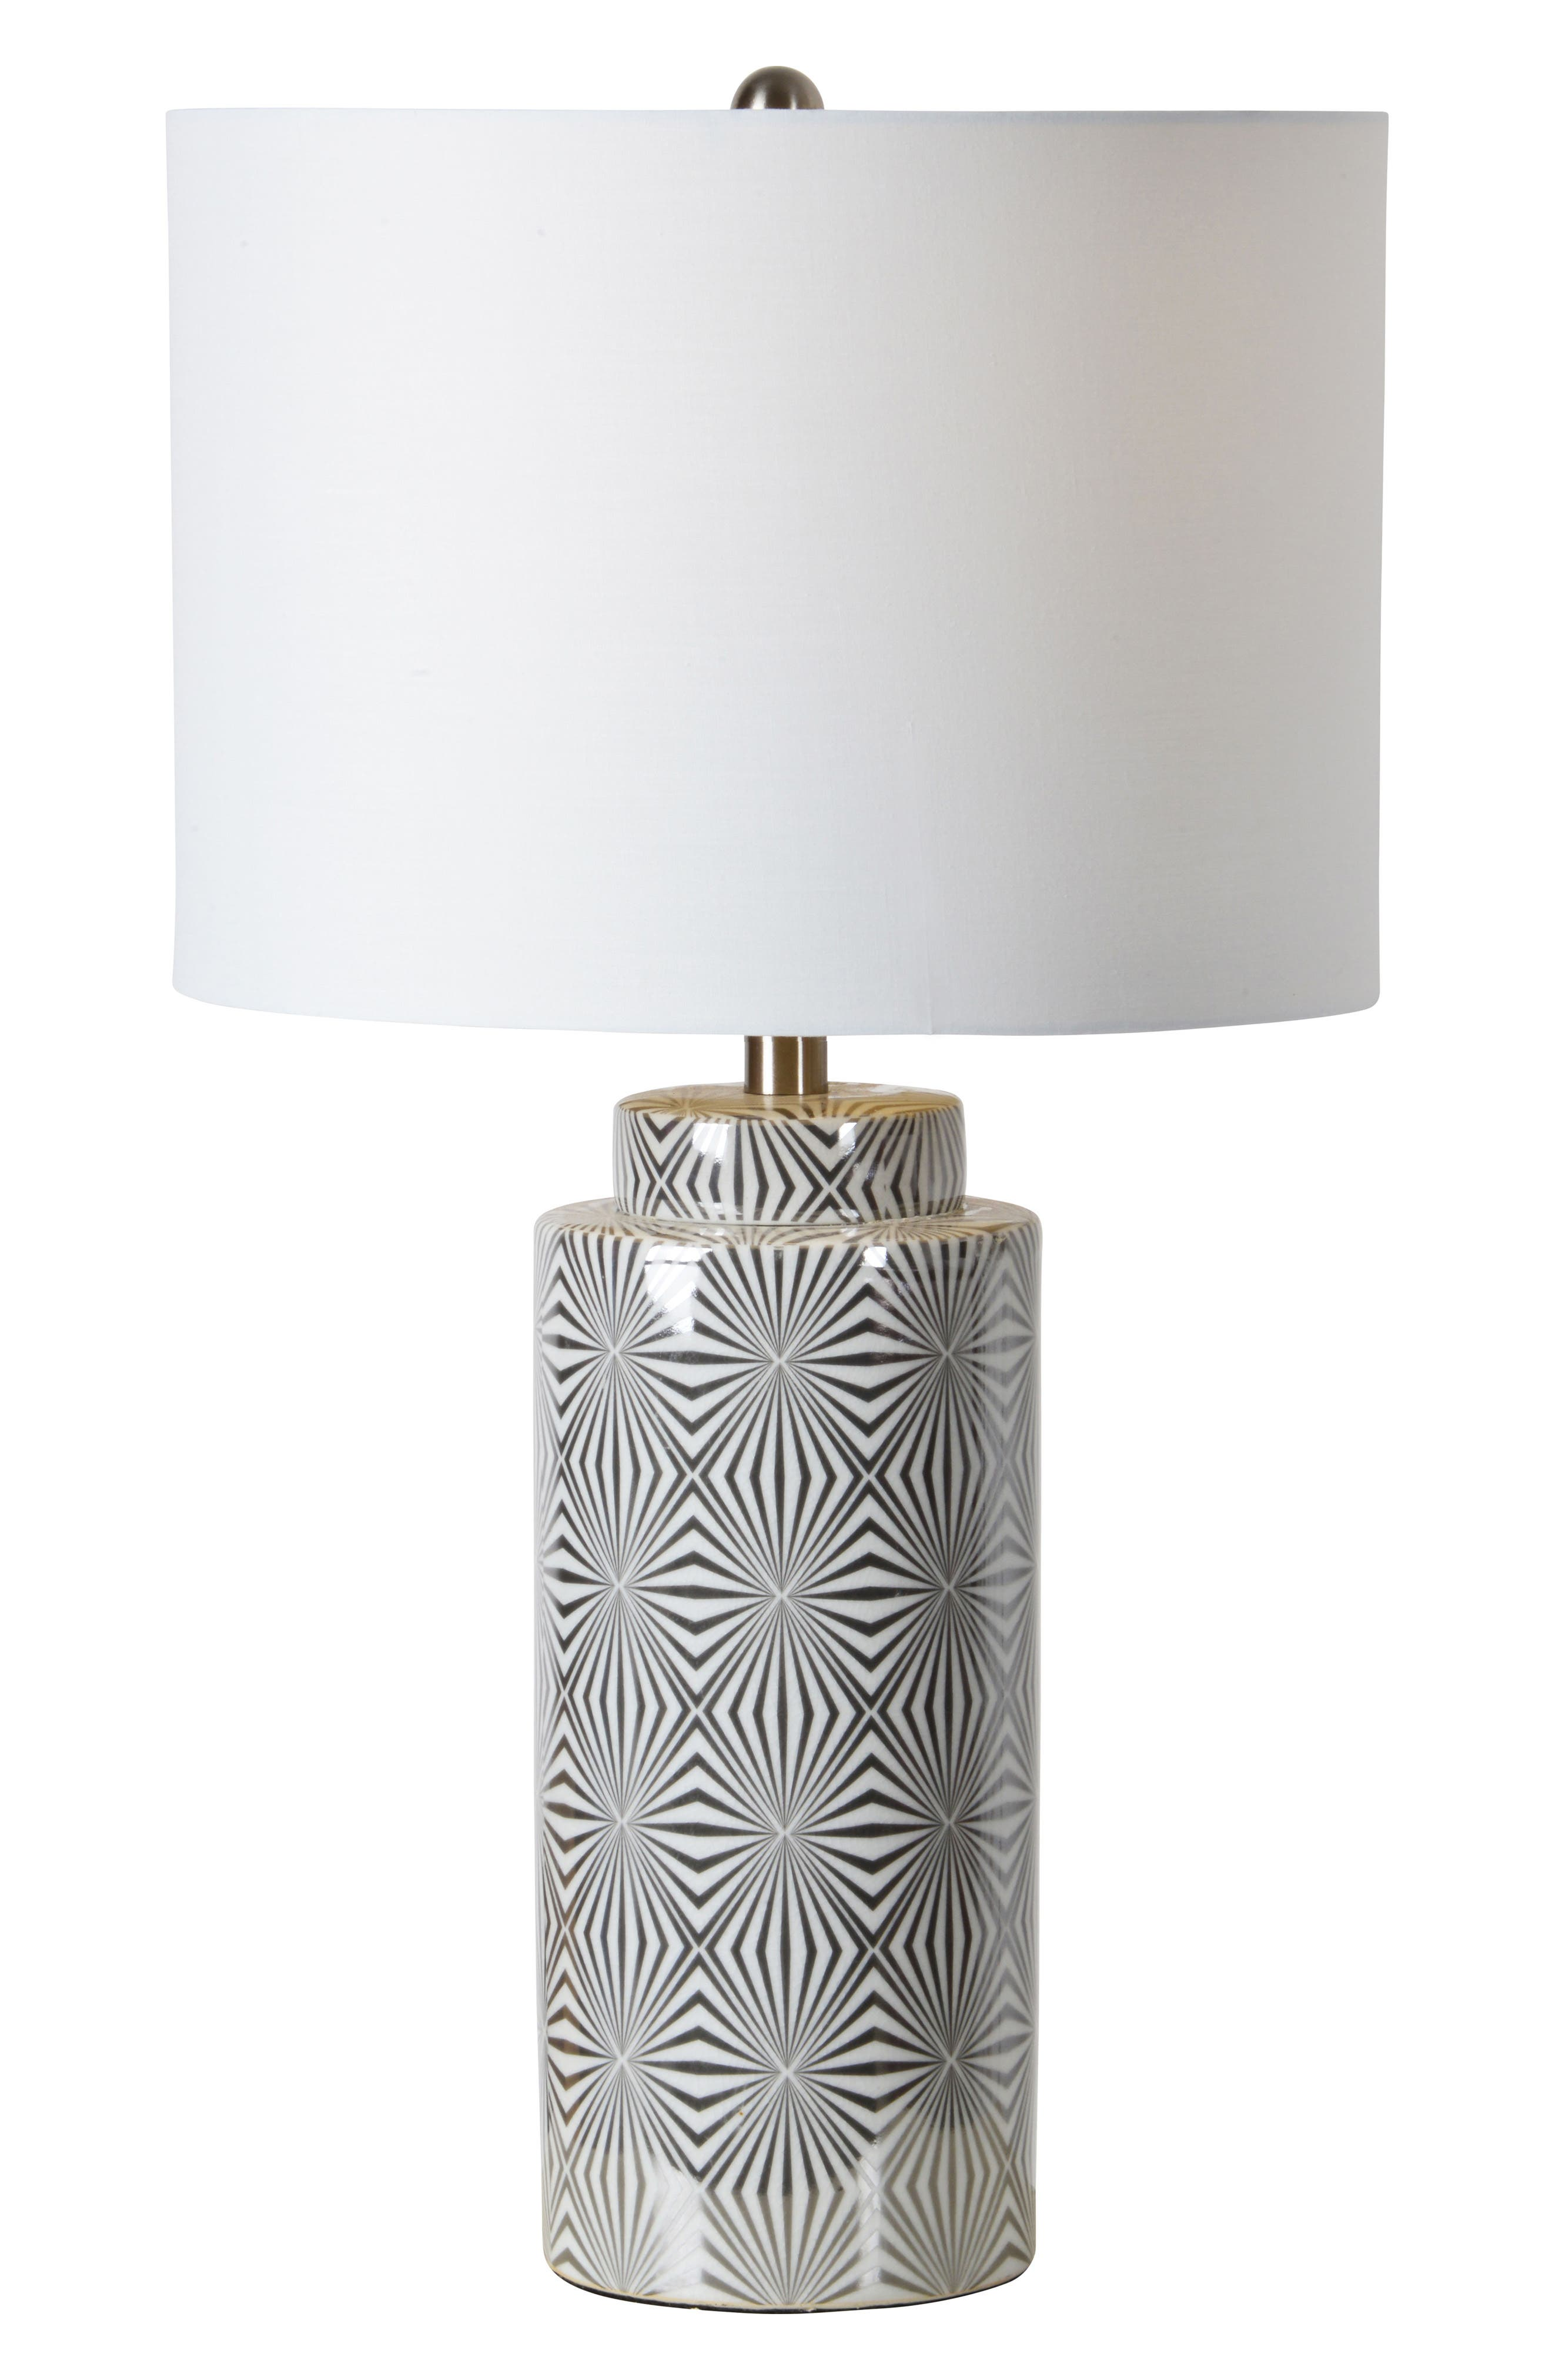 Camden Table Lamp,                             Main thumbnail 1, color,                             Silver/ White